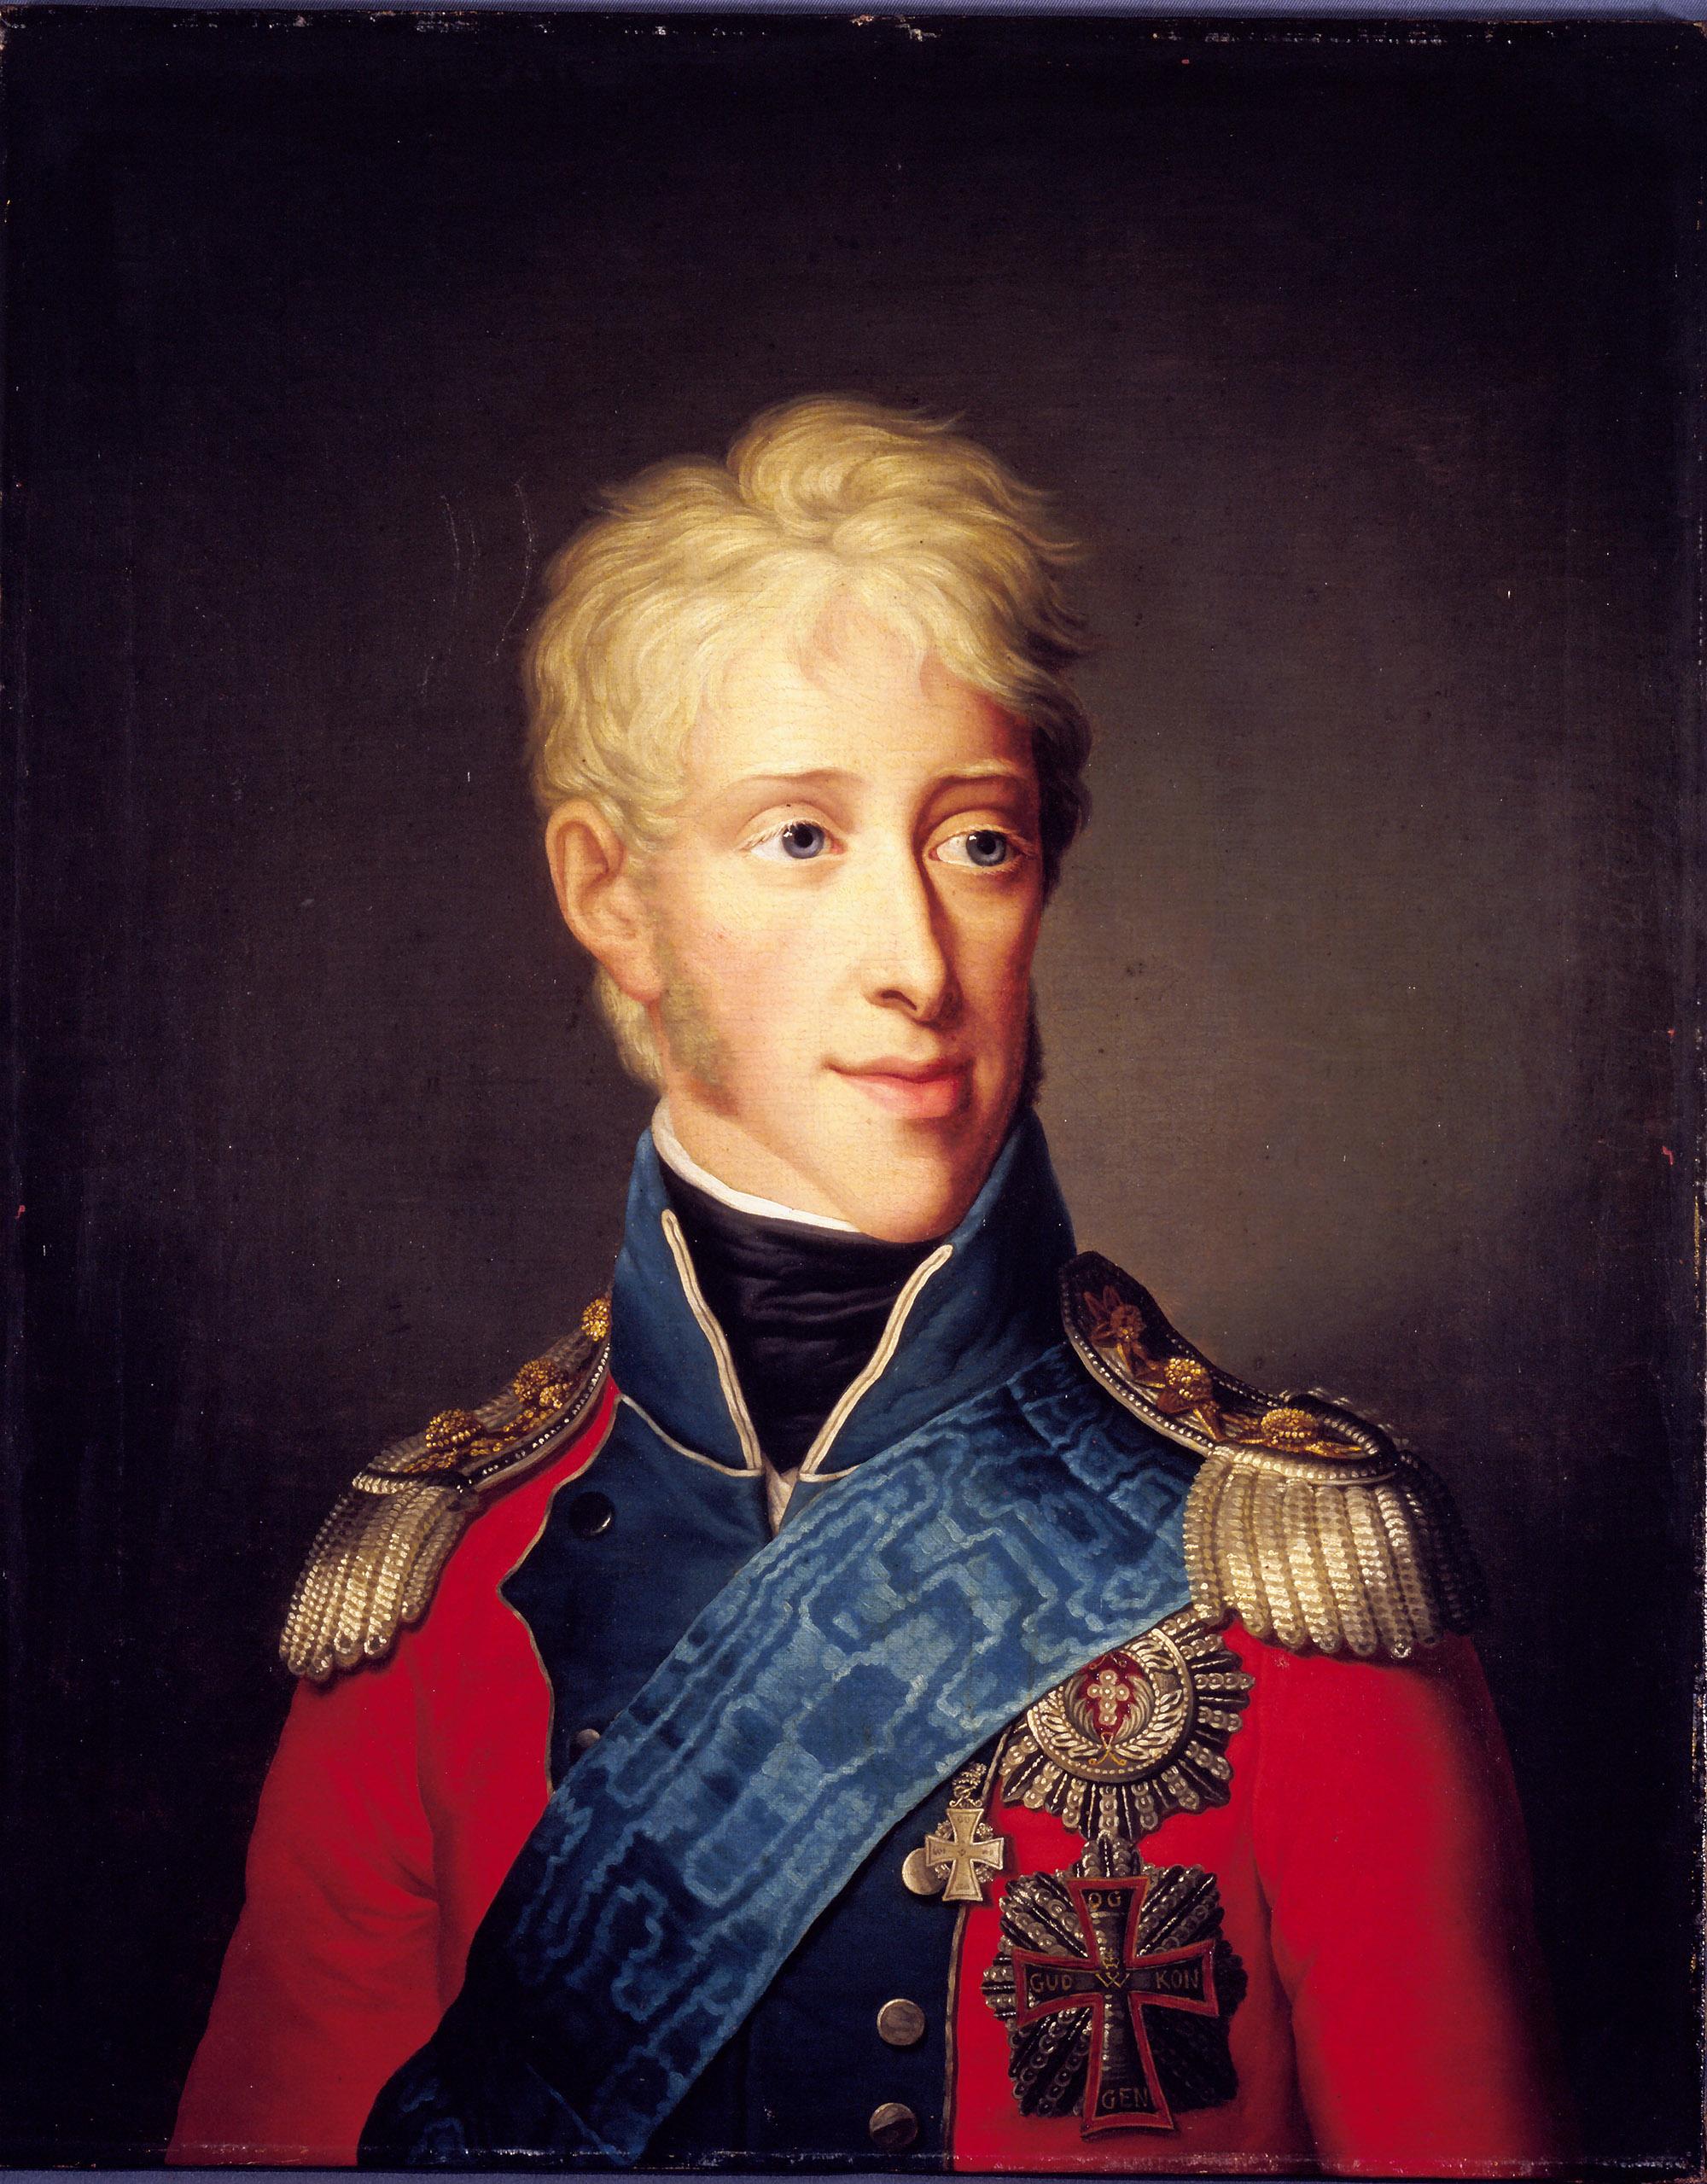 Fryderyk VI